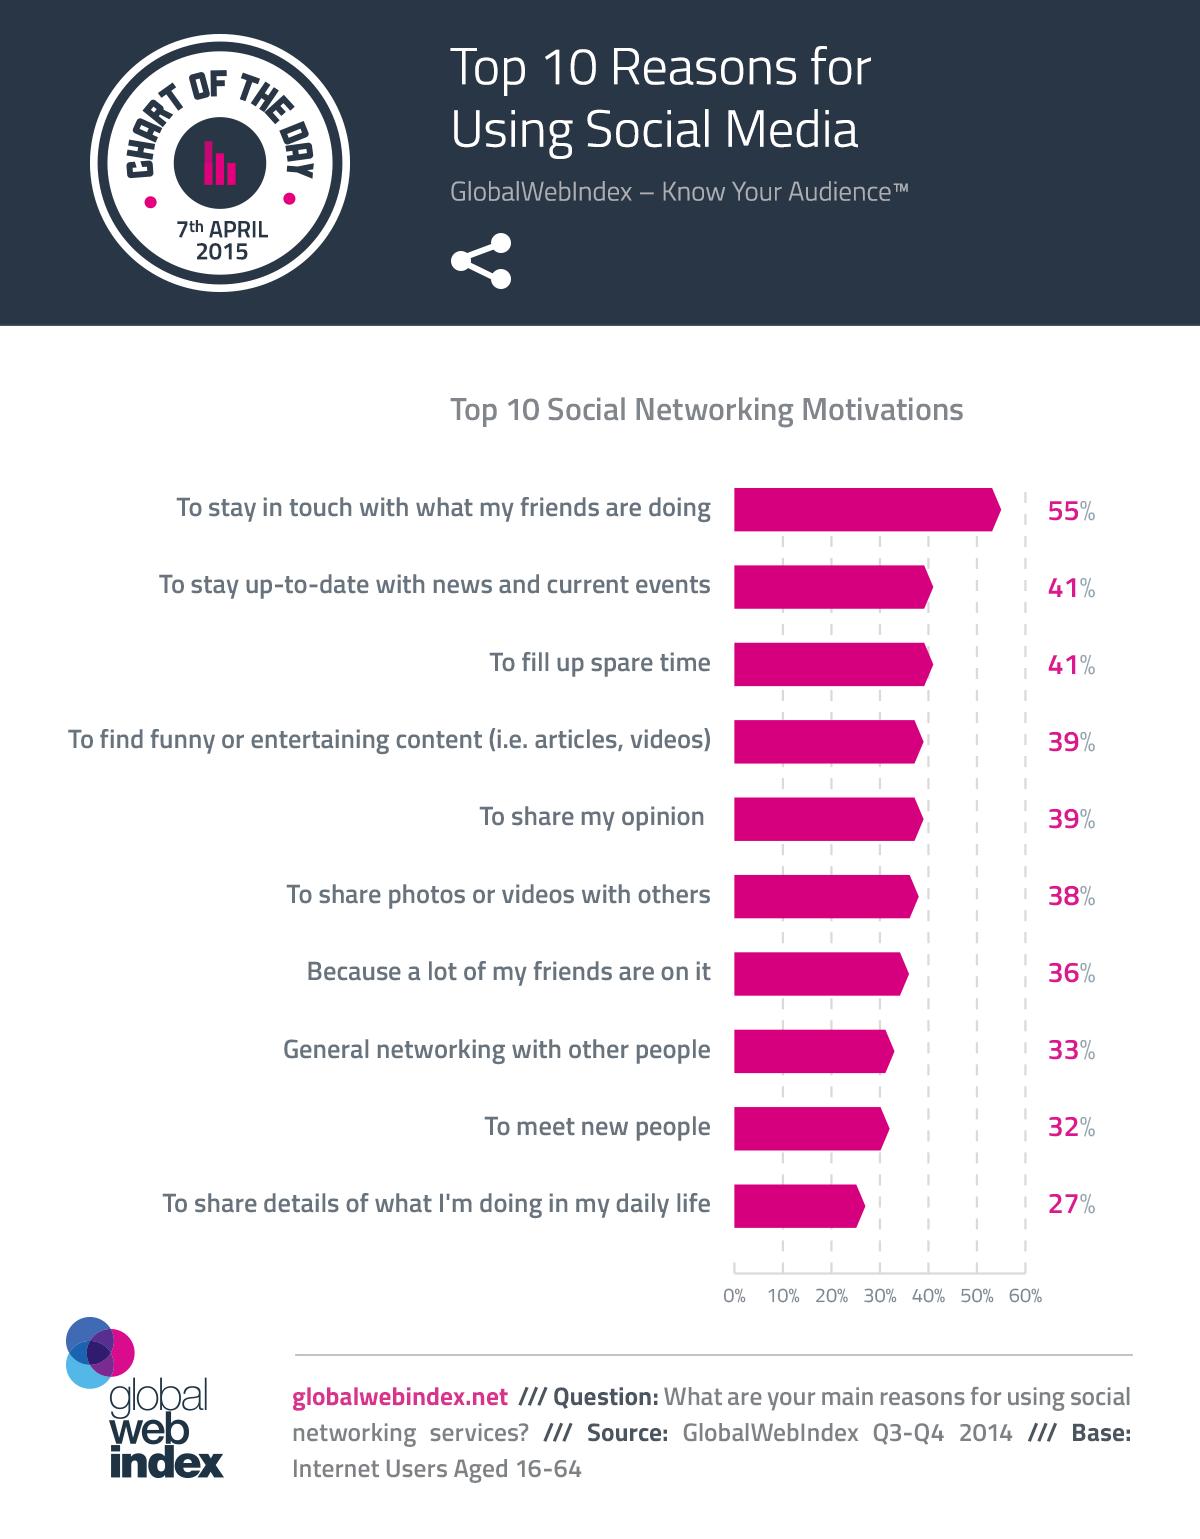 7th-April-2015-Top-10-Reasons-for-Using-Social-Media